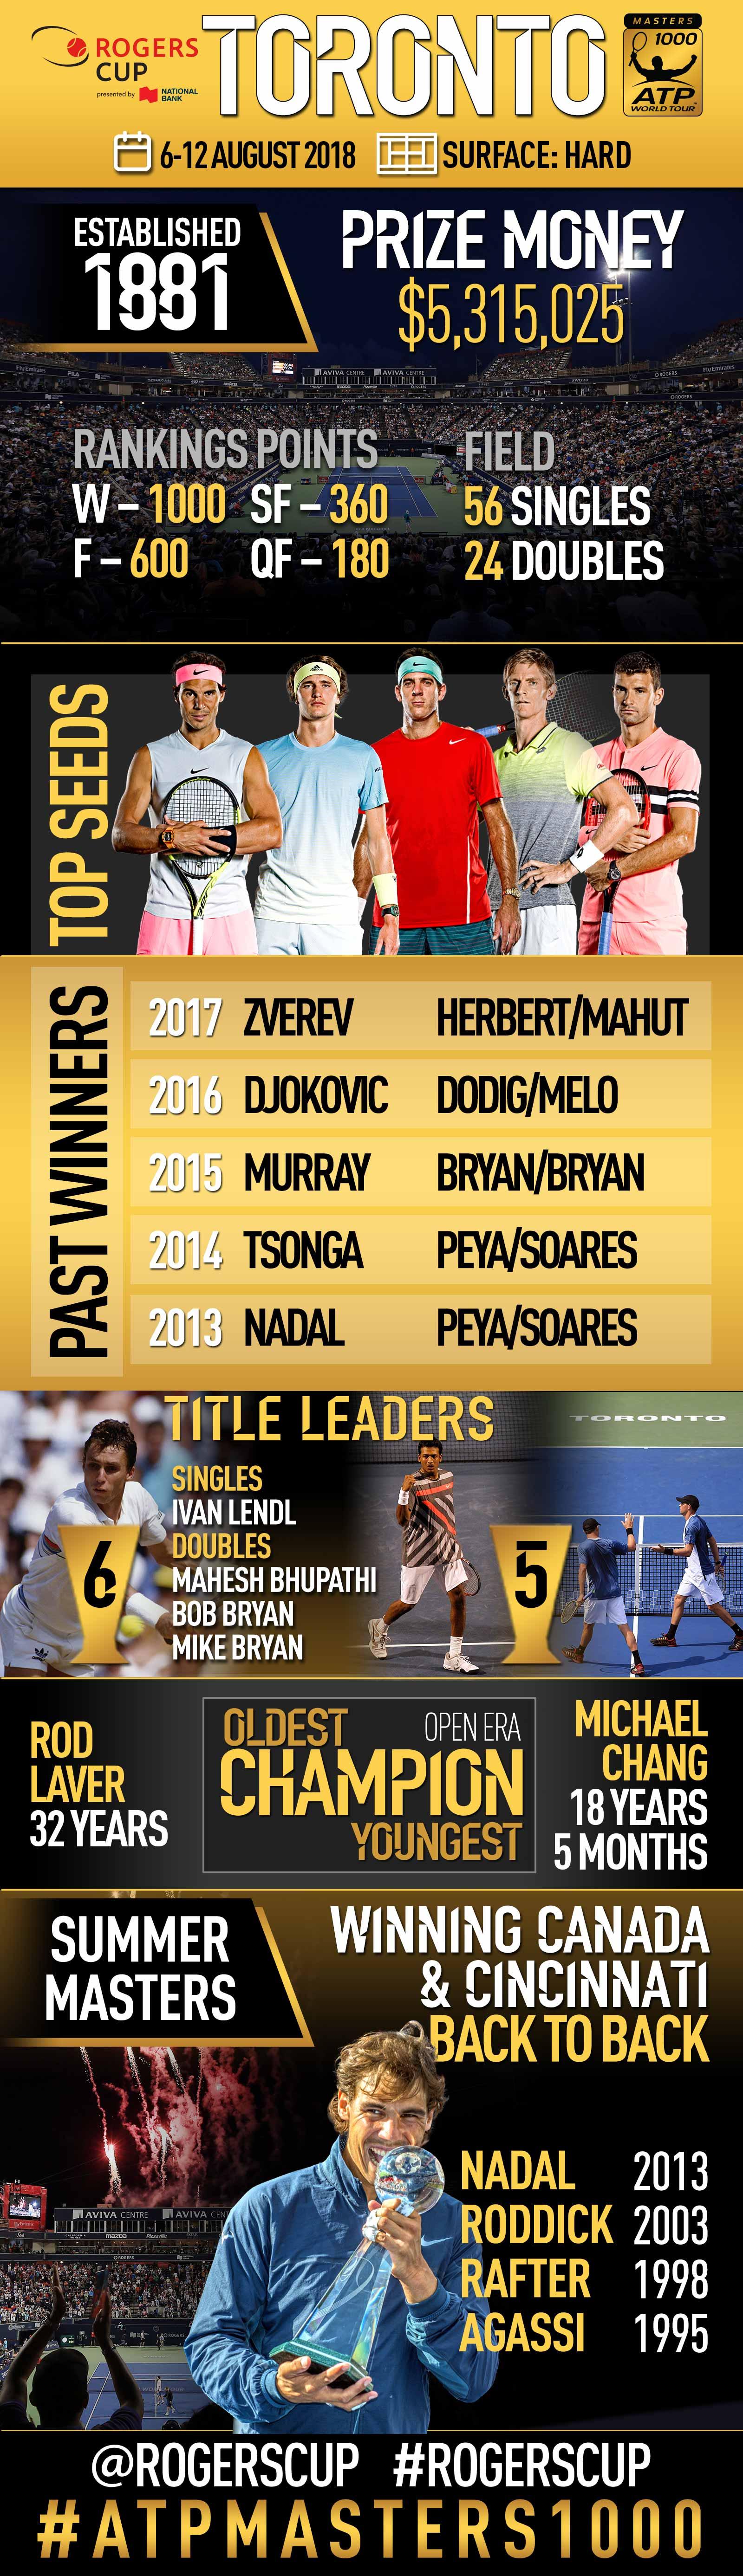 <a href='https://www.atpworldtour.com/en/tournaments/toronto/421/overview'>Rogers Cup</a>